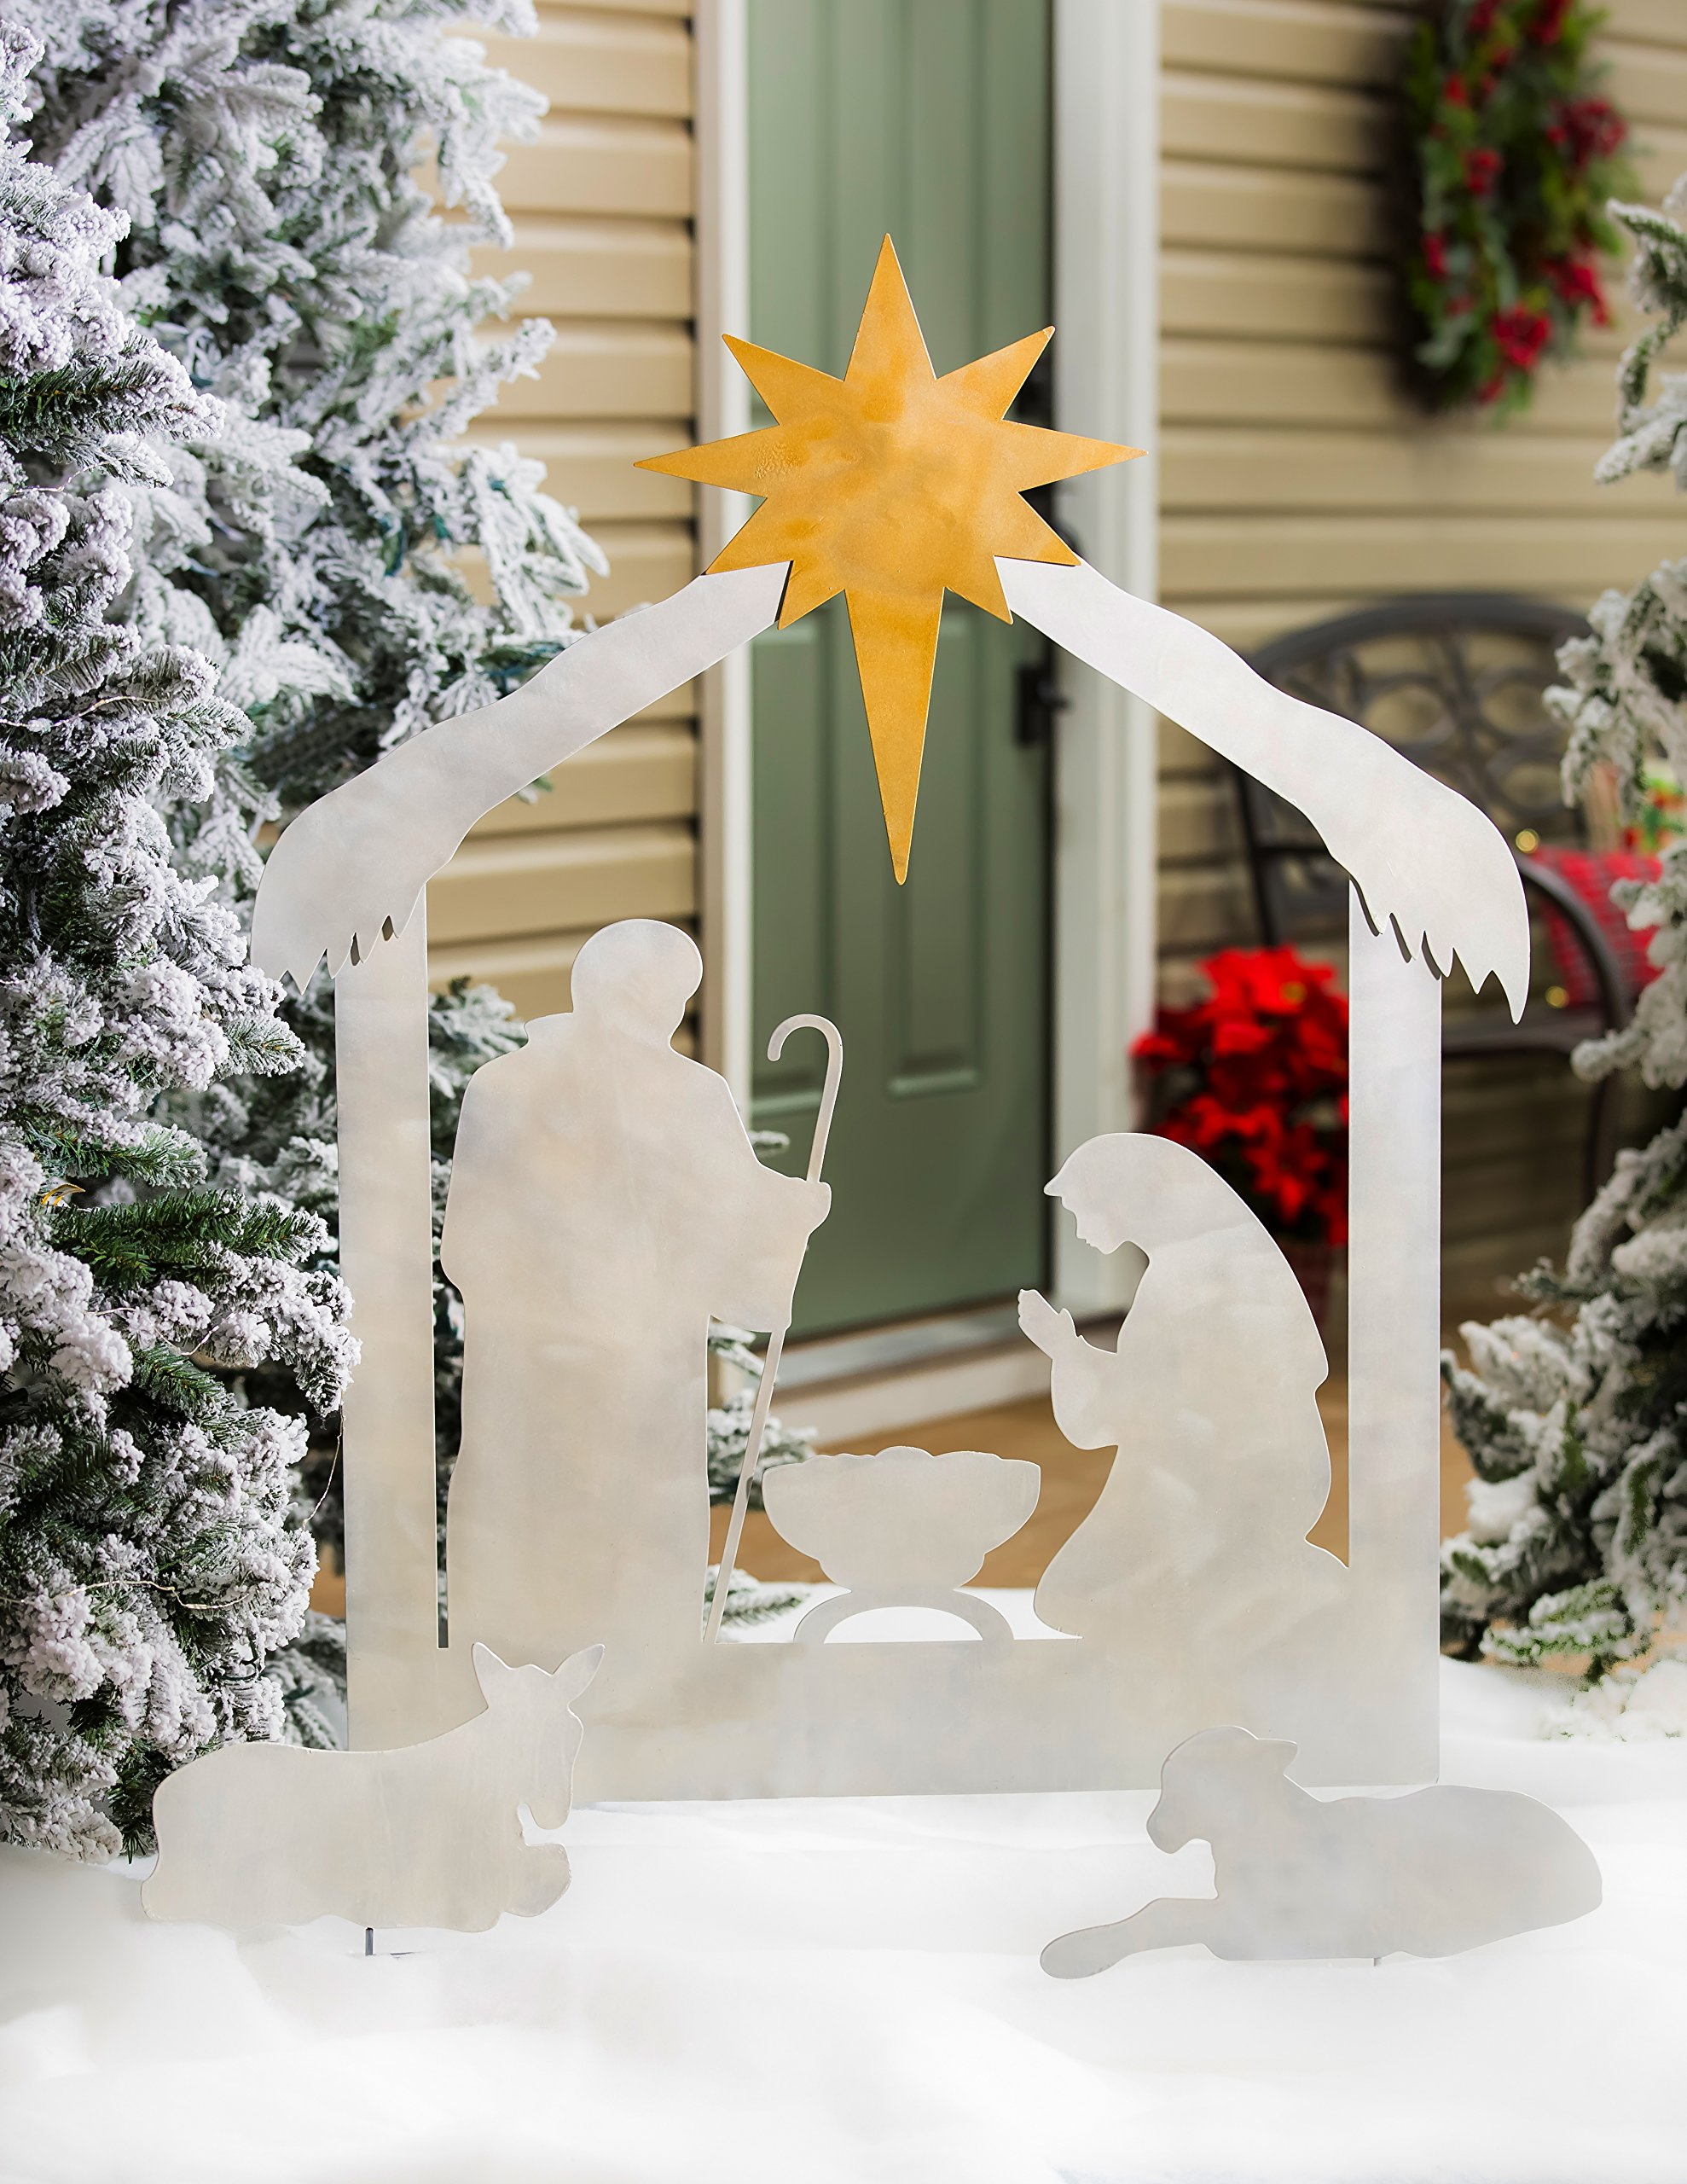 New Creative Christmas Nativity Scene, Laser Cut Metal Yard Décor